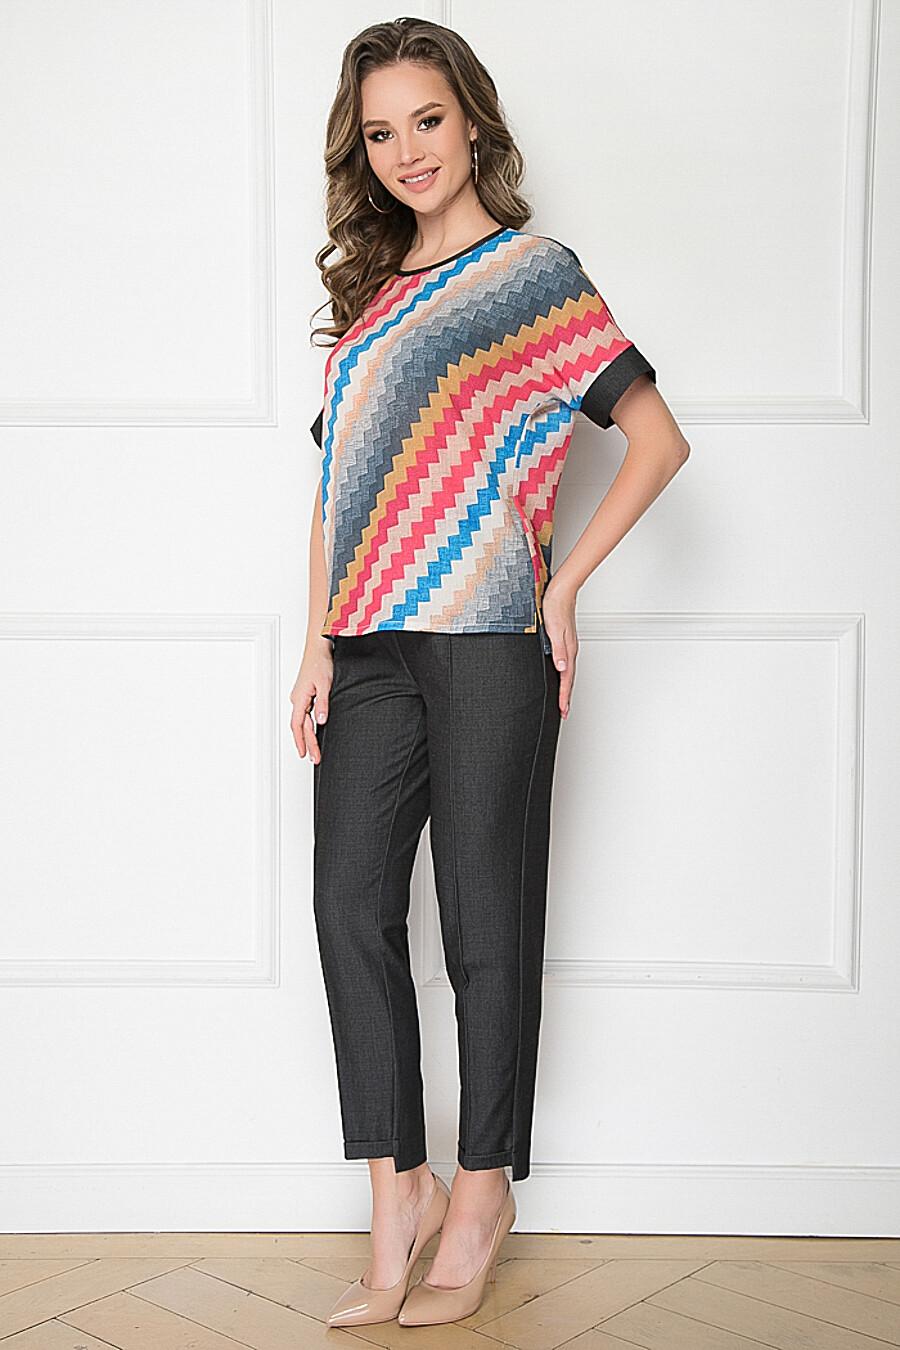 КОСТЮМ ГАЛЛУРА (БЛУ РЭД) BELLOVERA (289670), купить в Moyo.moda